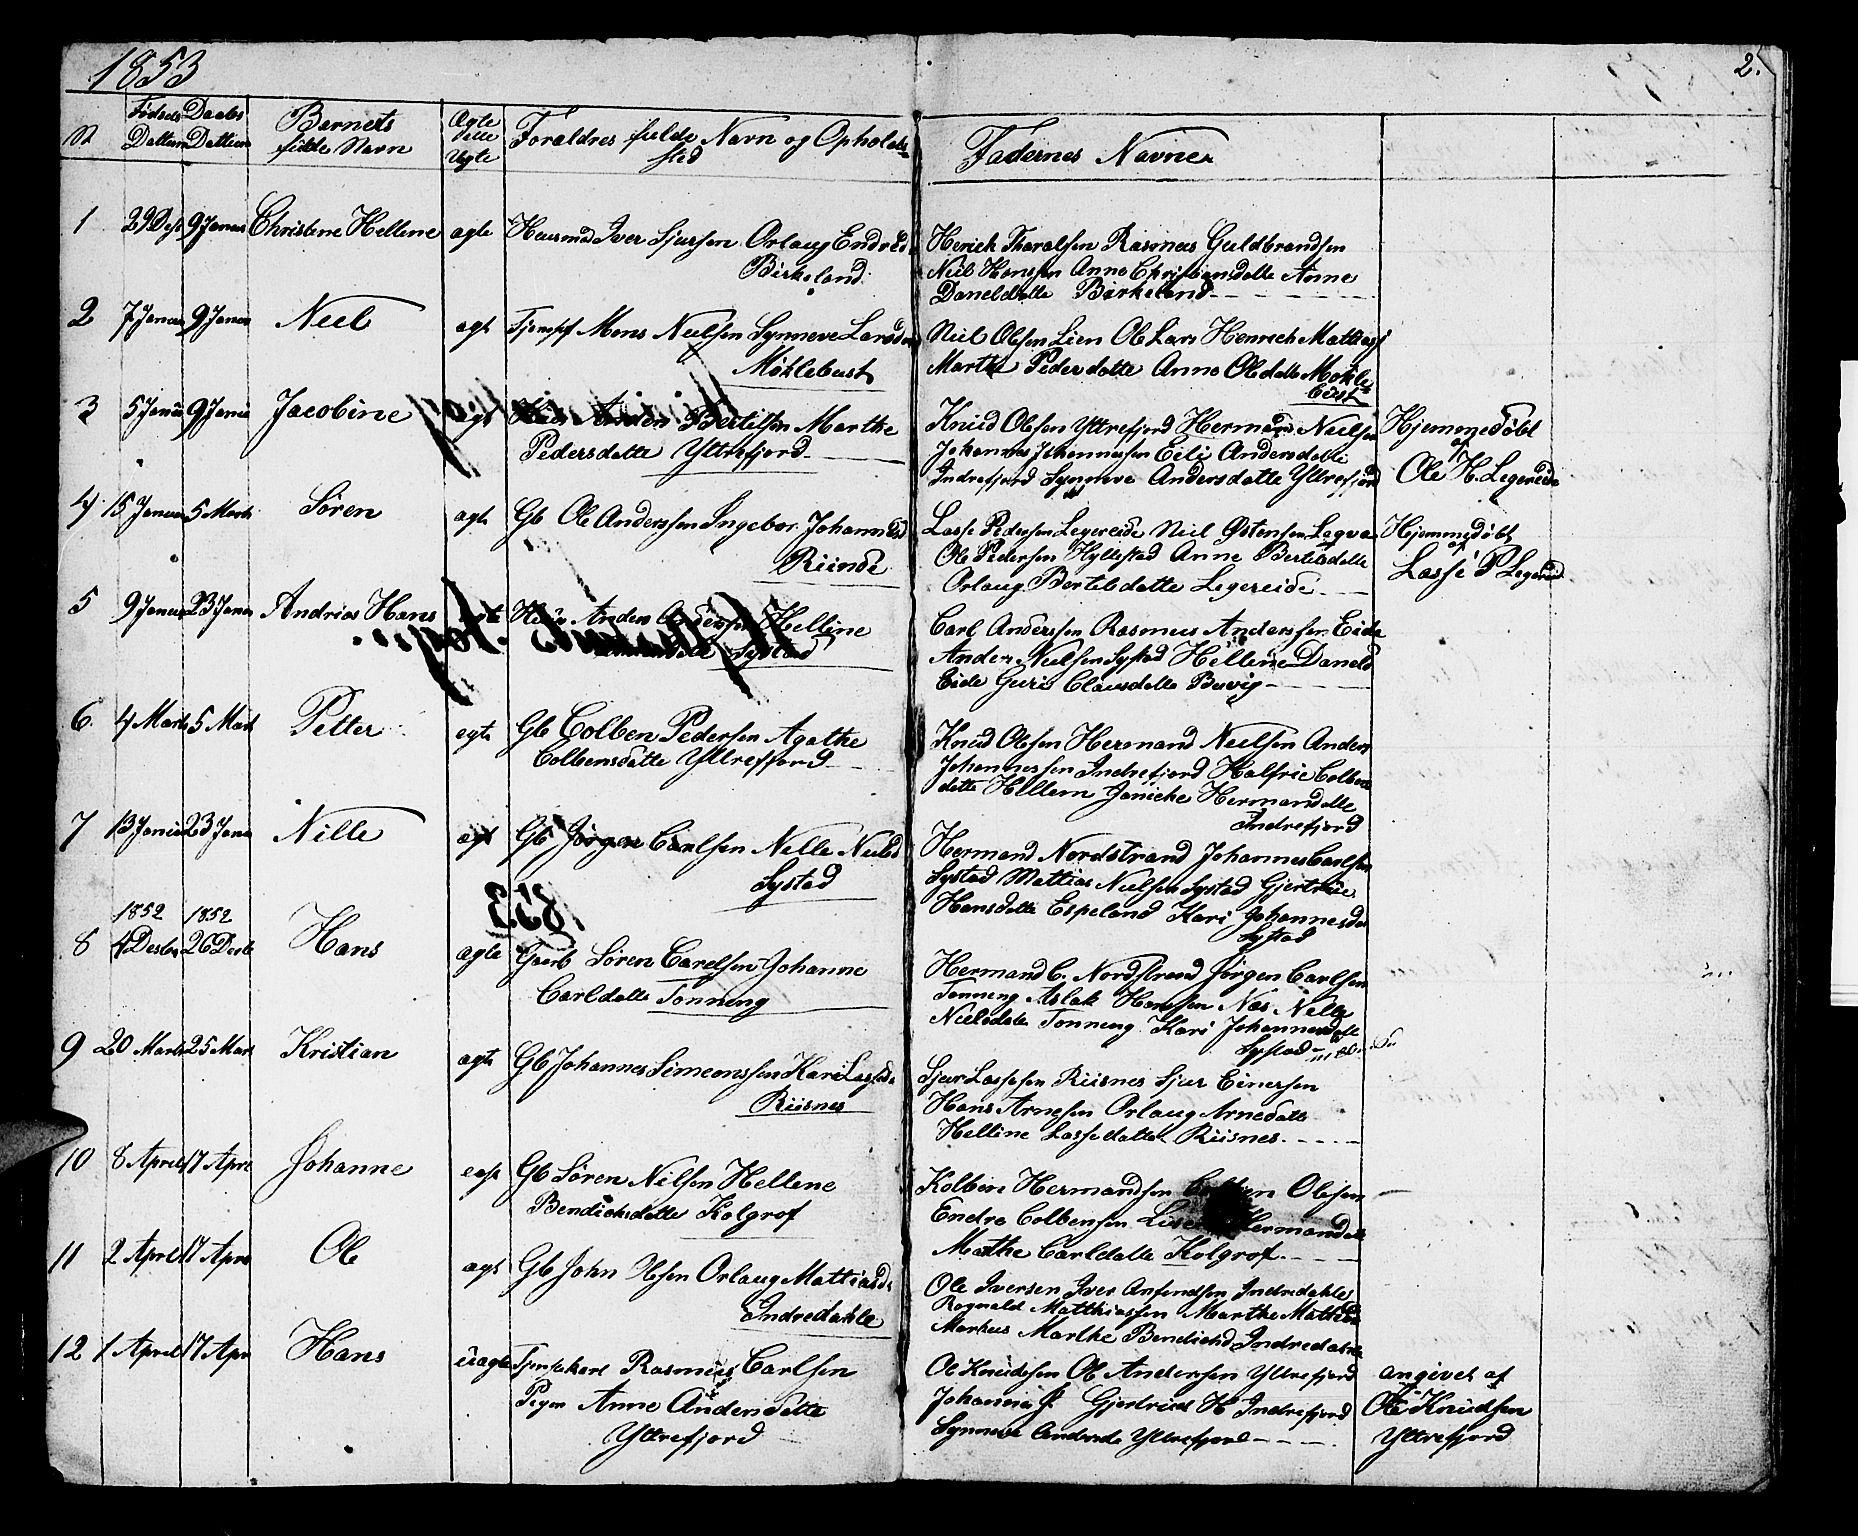 SAB, Hyllestad Sokneprestembete, Klokkerbok nr. A 1, 1853-1875, s. 2